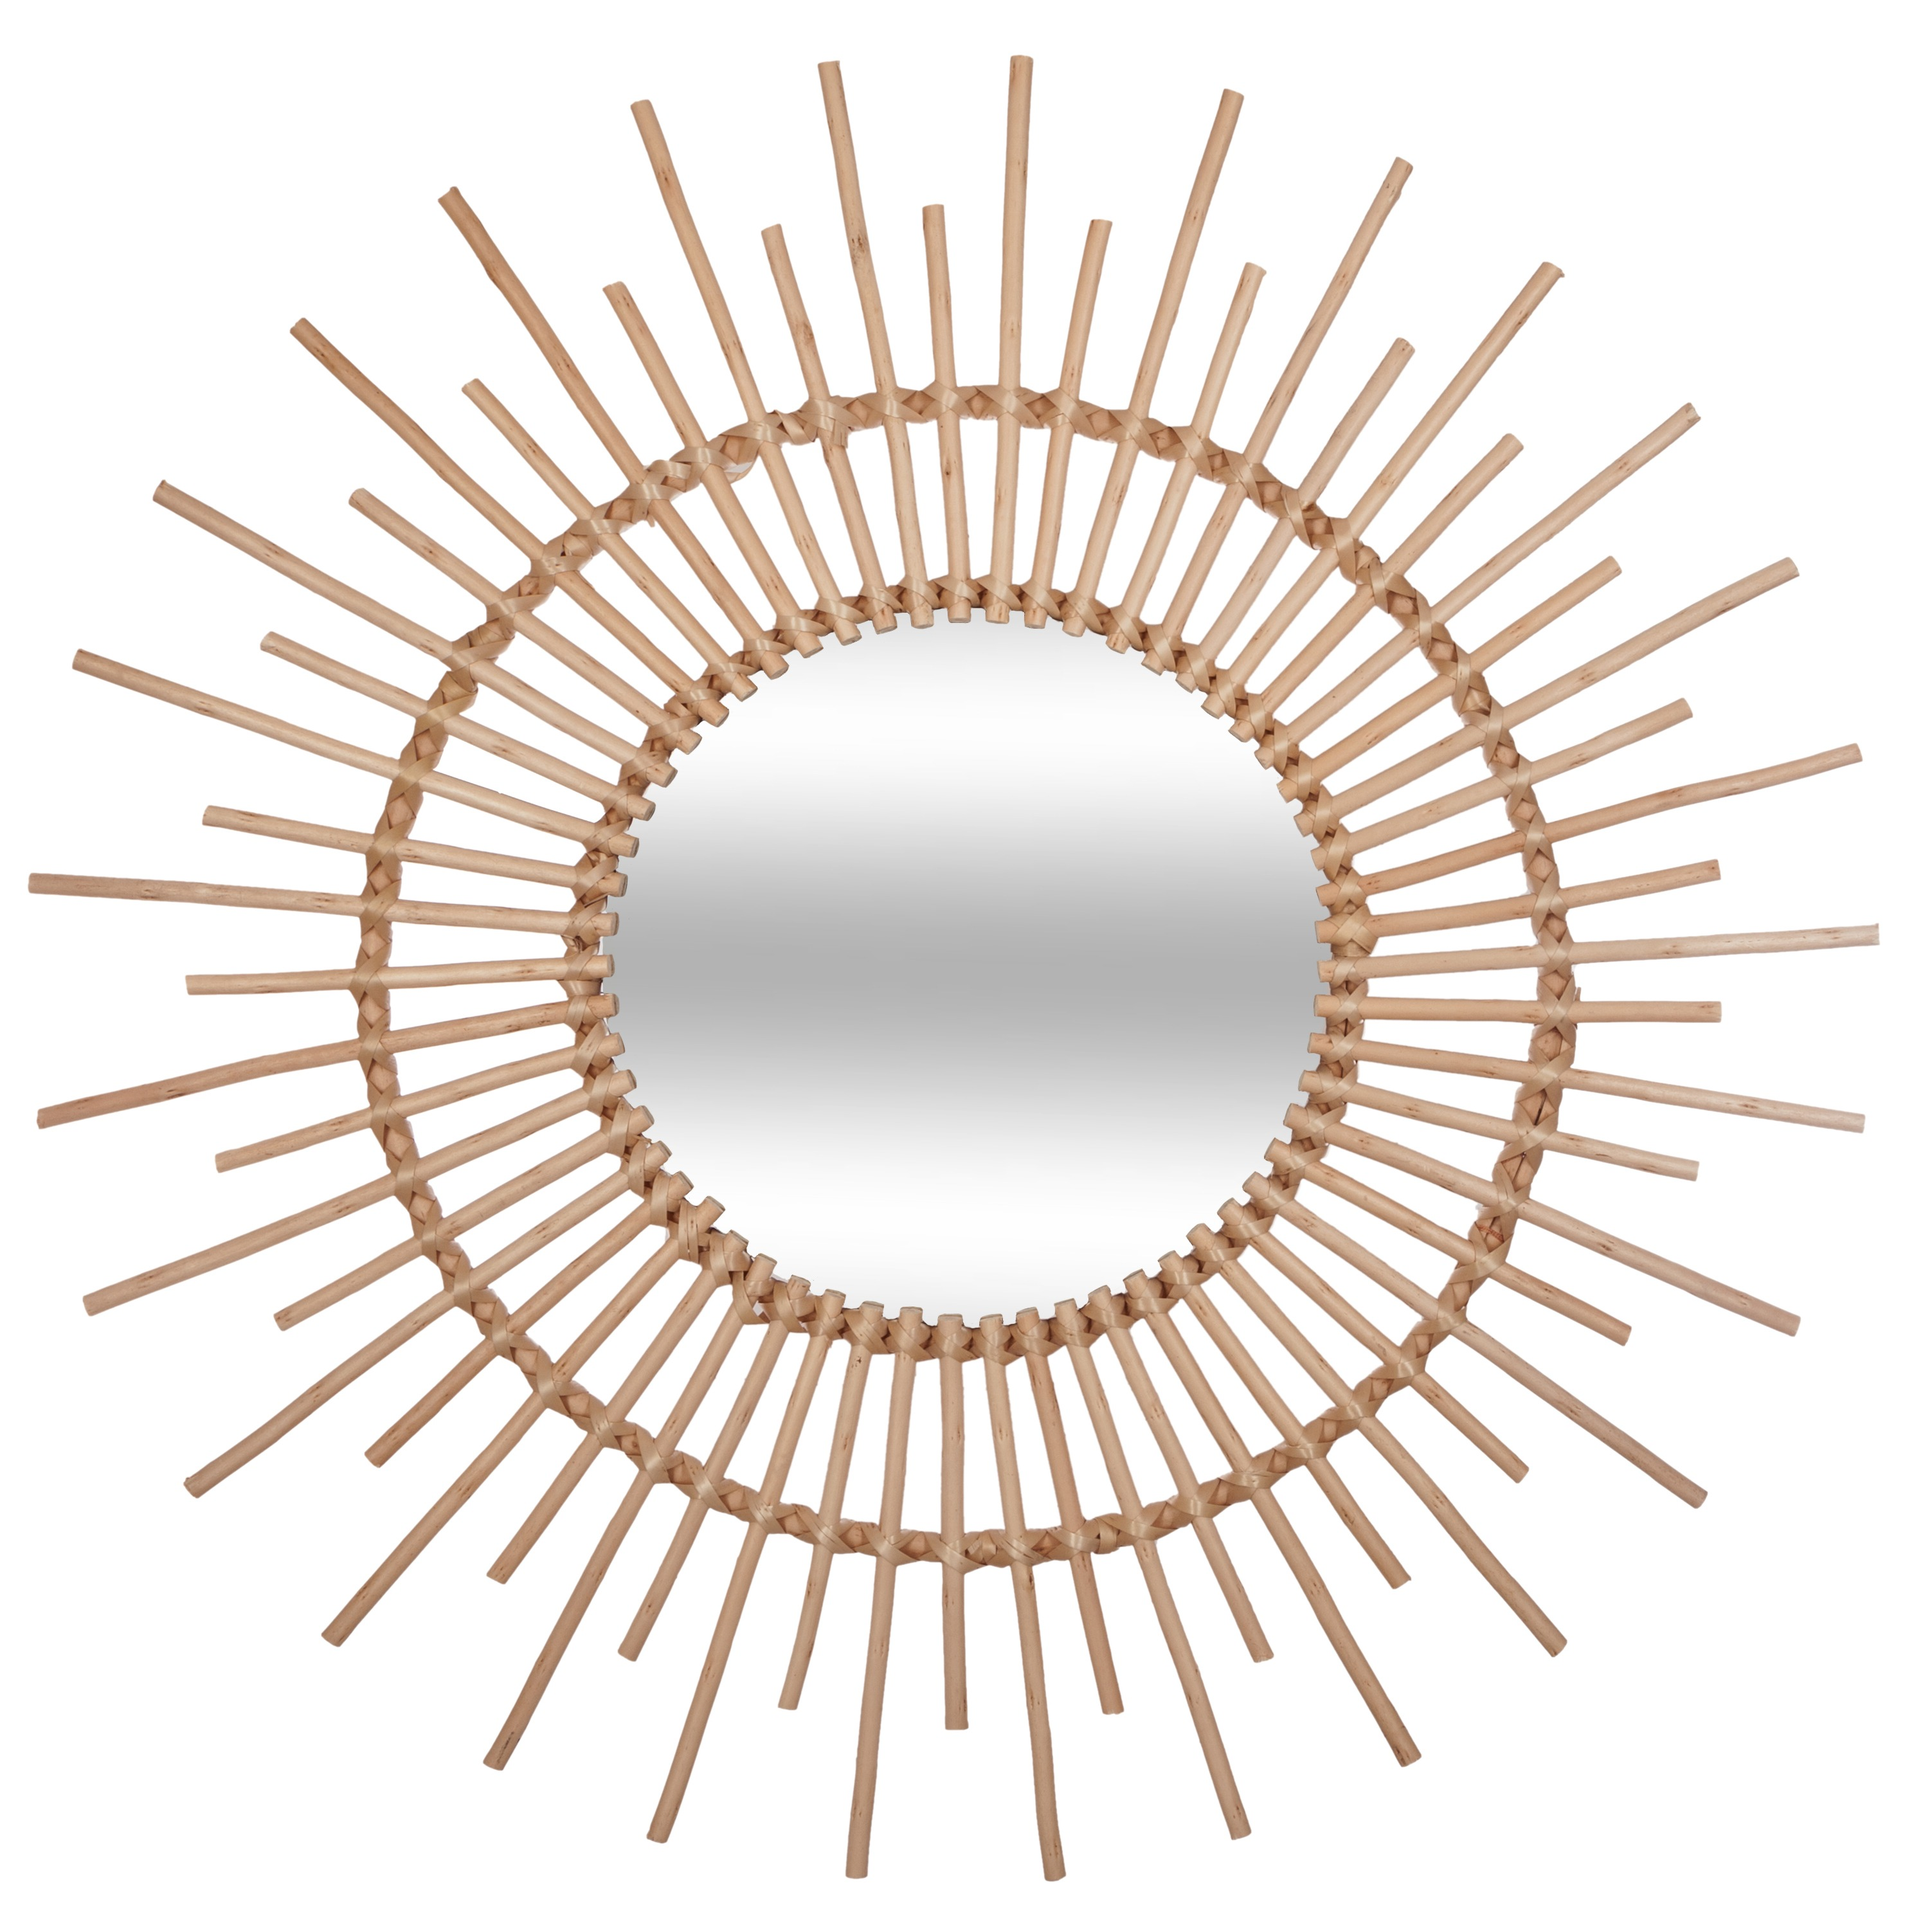 RATAN SUN MIRROR 76CM